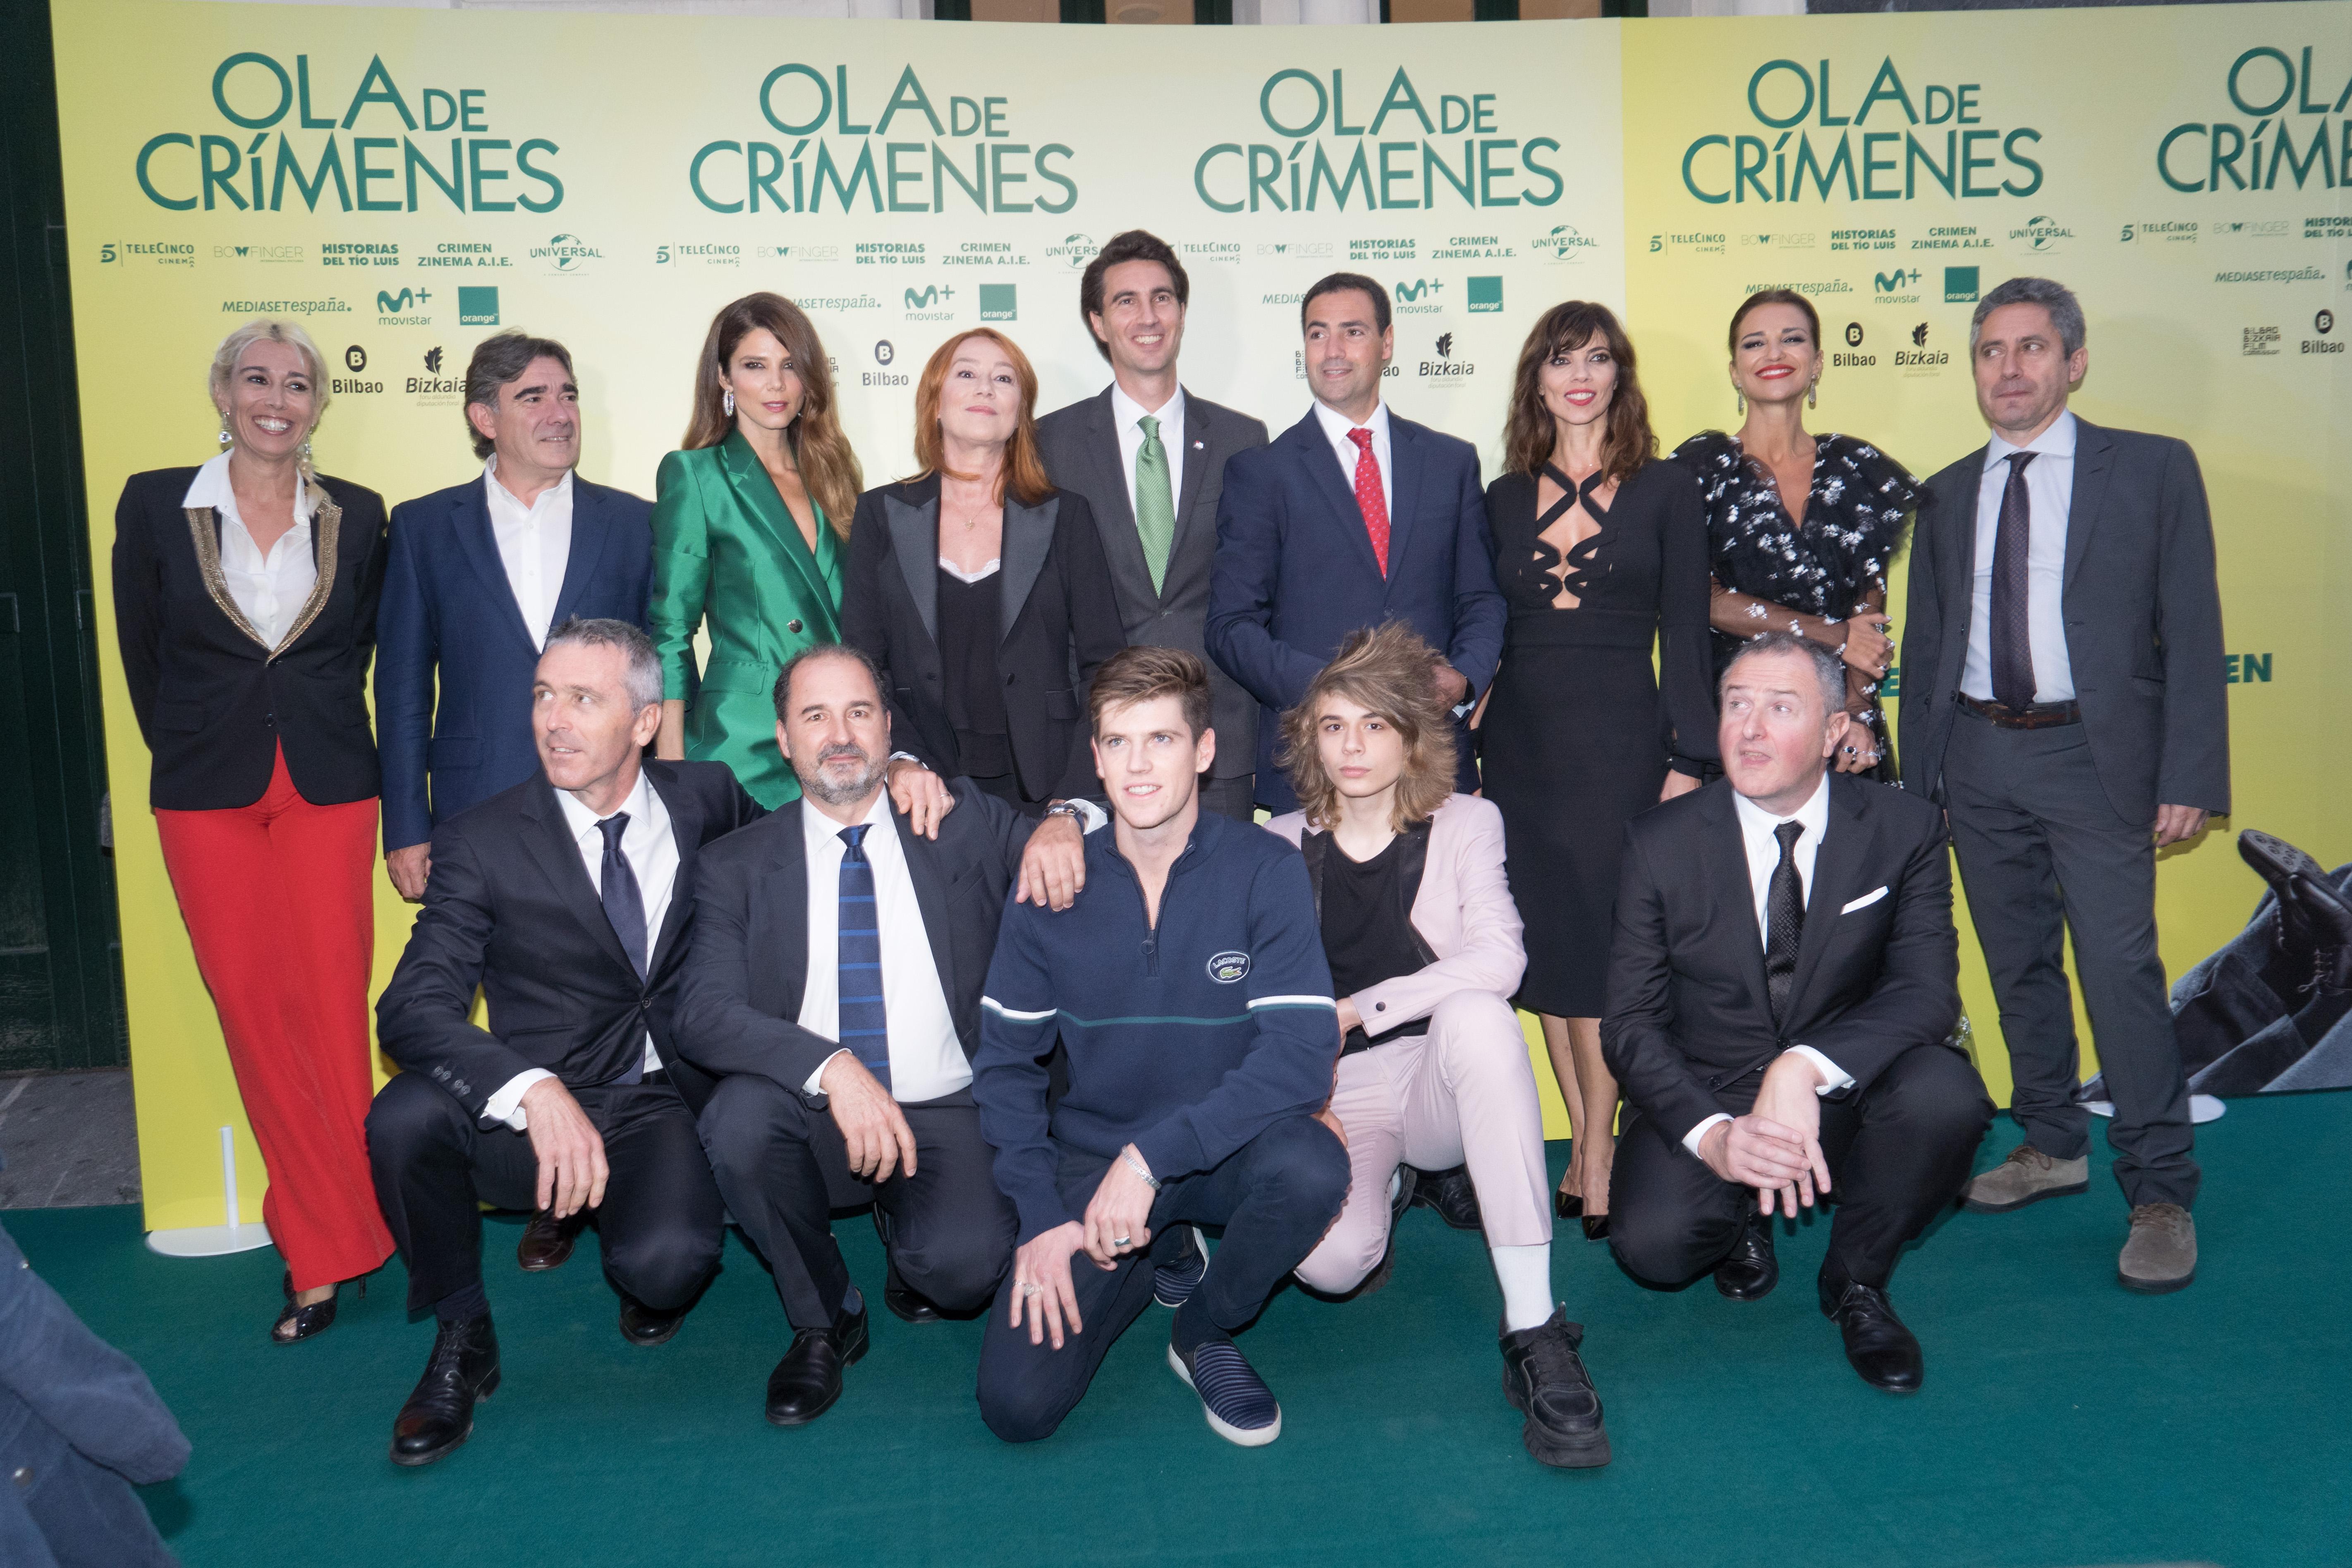 "GRACIA QUEREJETA, MARIBEL VERDÚ, PAULA ECHEVARRIA AND JUANA ACOSTA AT THE PREVIEW OF ""OLA DE CRÍMENES"" IN BILBAO"